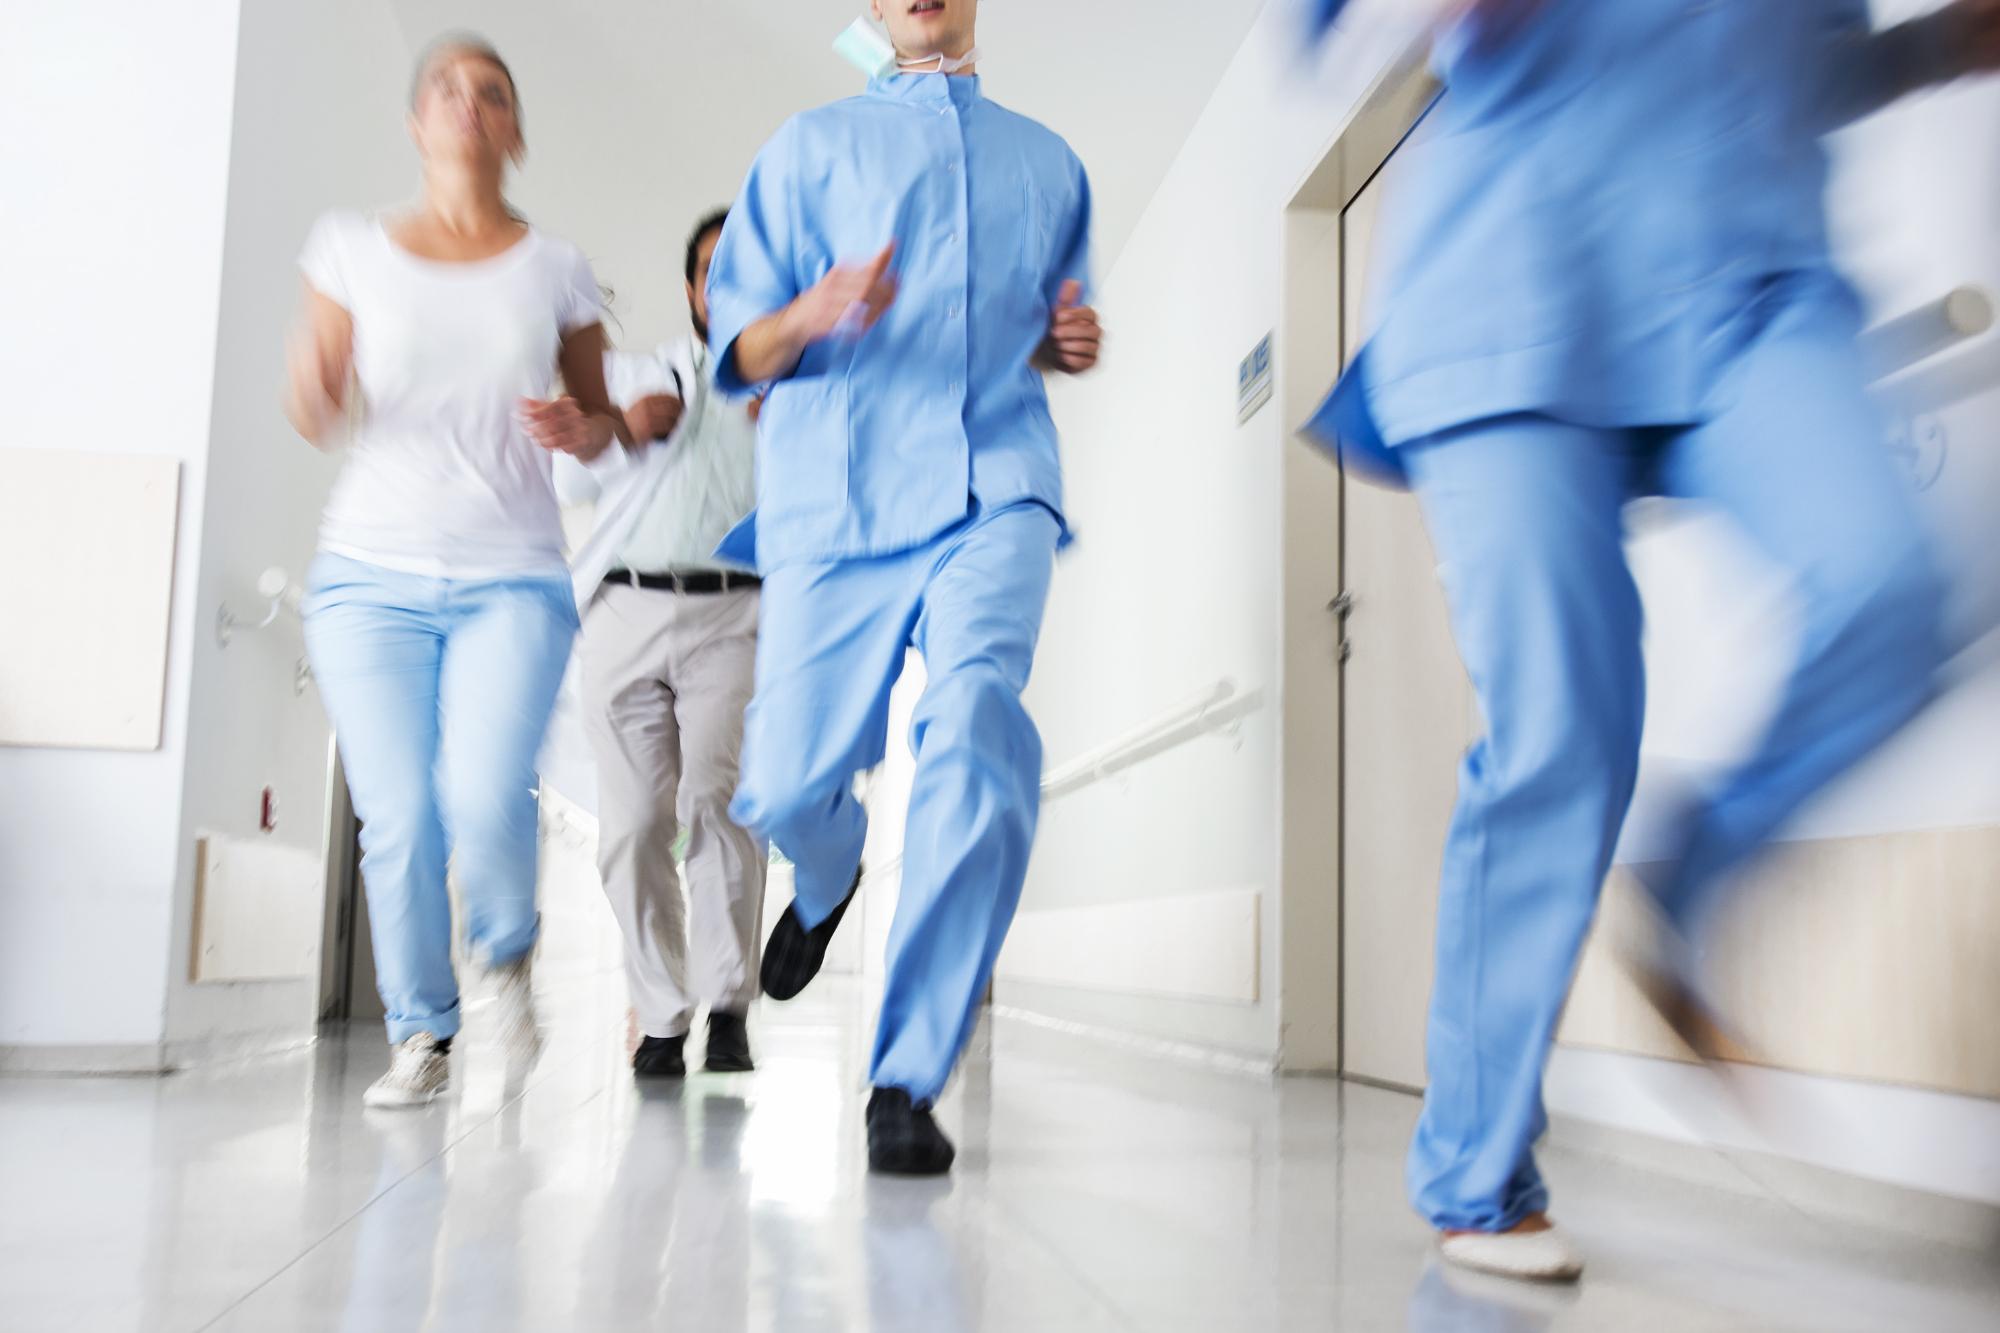 Hey, ER Docs: You Rock